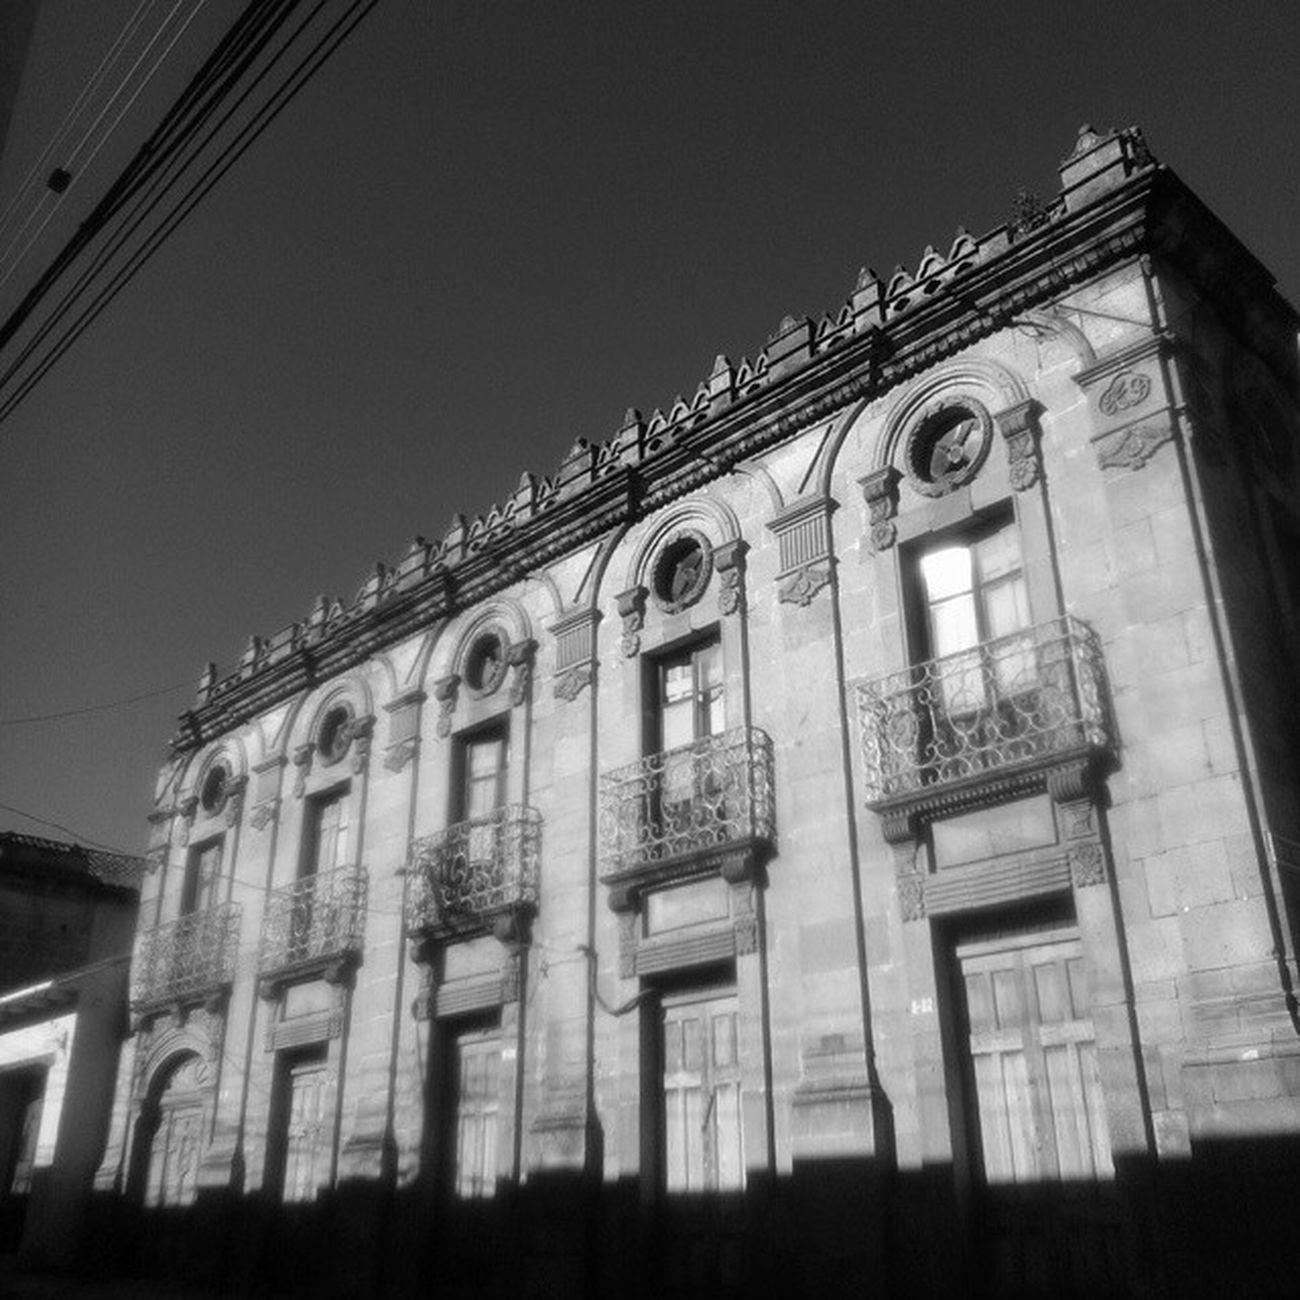 Xela neoclásica / Neoclassical Xela Xela Guatemala Arquitectura Edificio Viajes  Historia Architecture Building Travel History Instaguate Instaguatemaya Guategram PerhapsYouNeedALittleGuatemala TheRealGuatemala VSCO Vscocam Vscourban Blackandwhite Blancoynegro